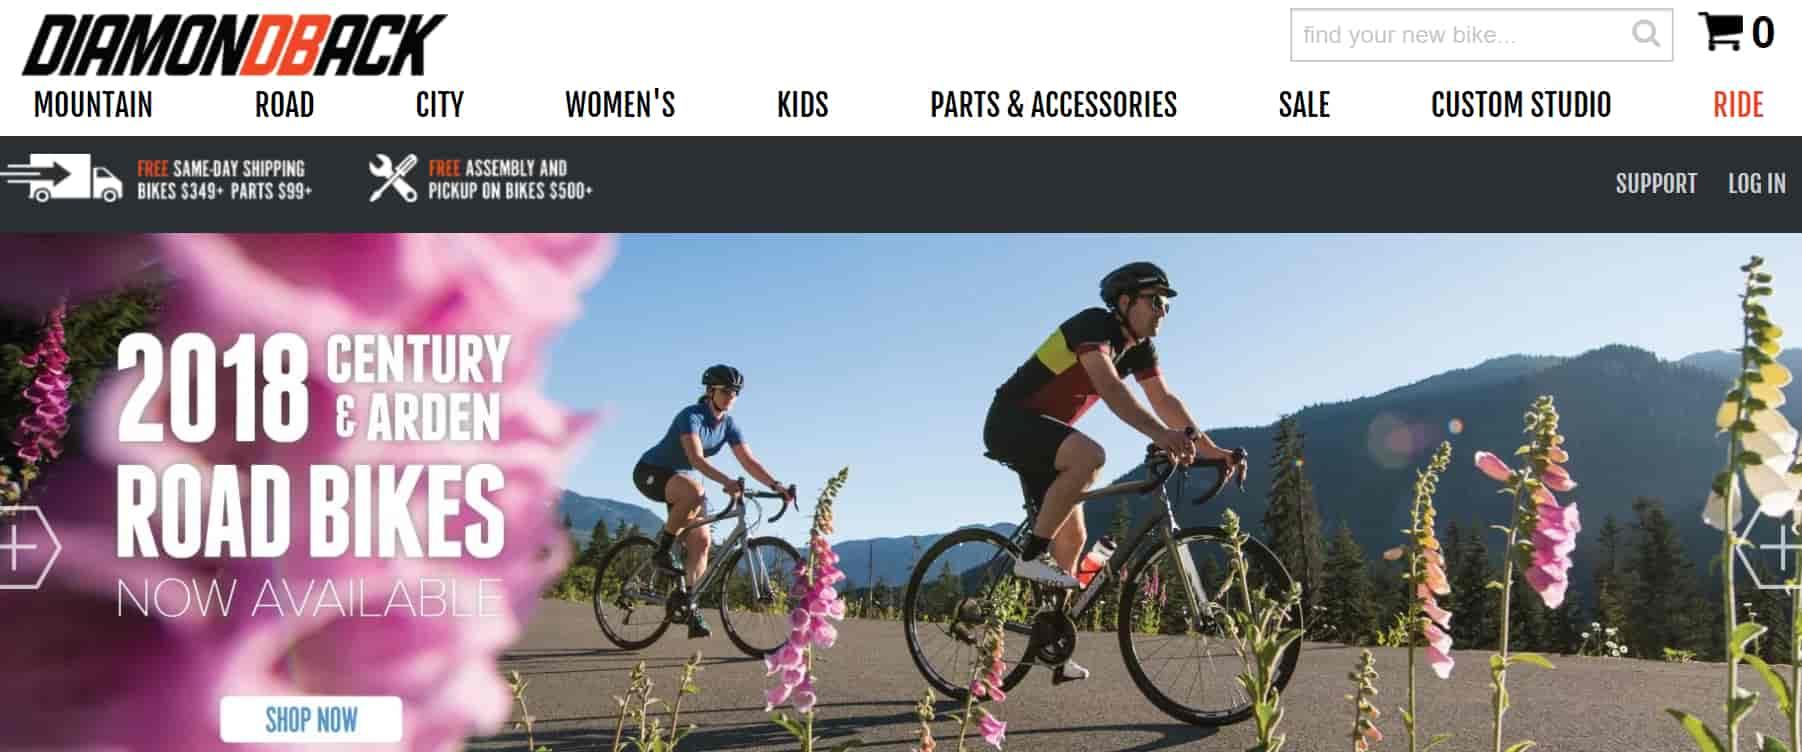 diamondback company bike : Testing & reviewing